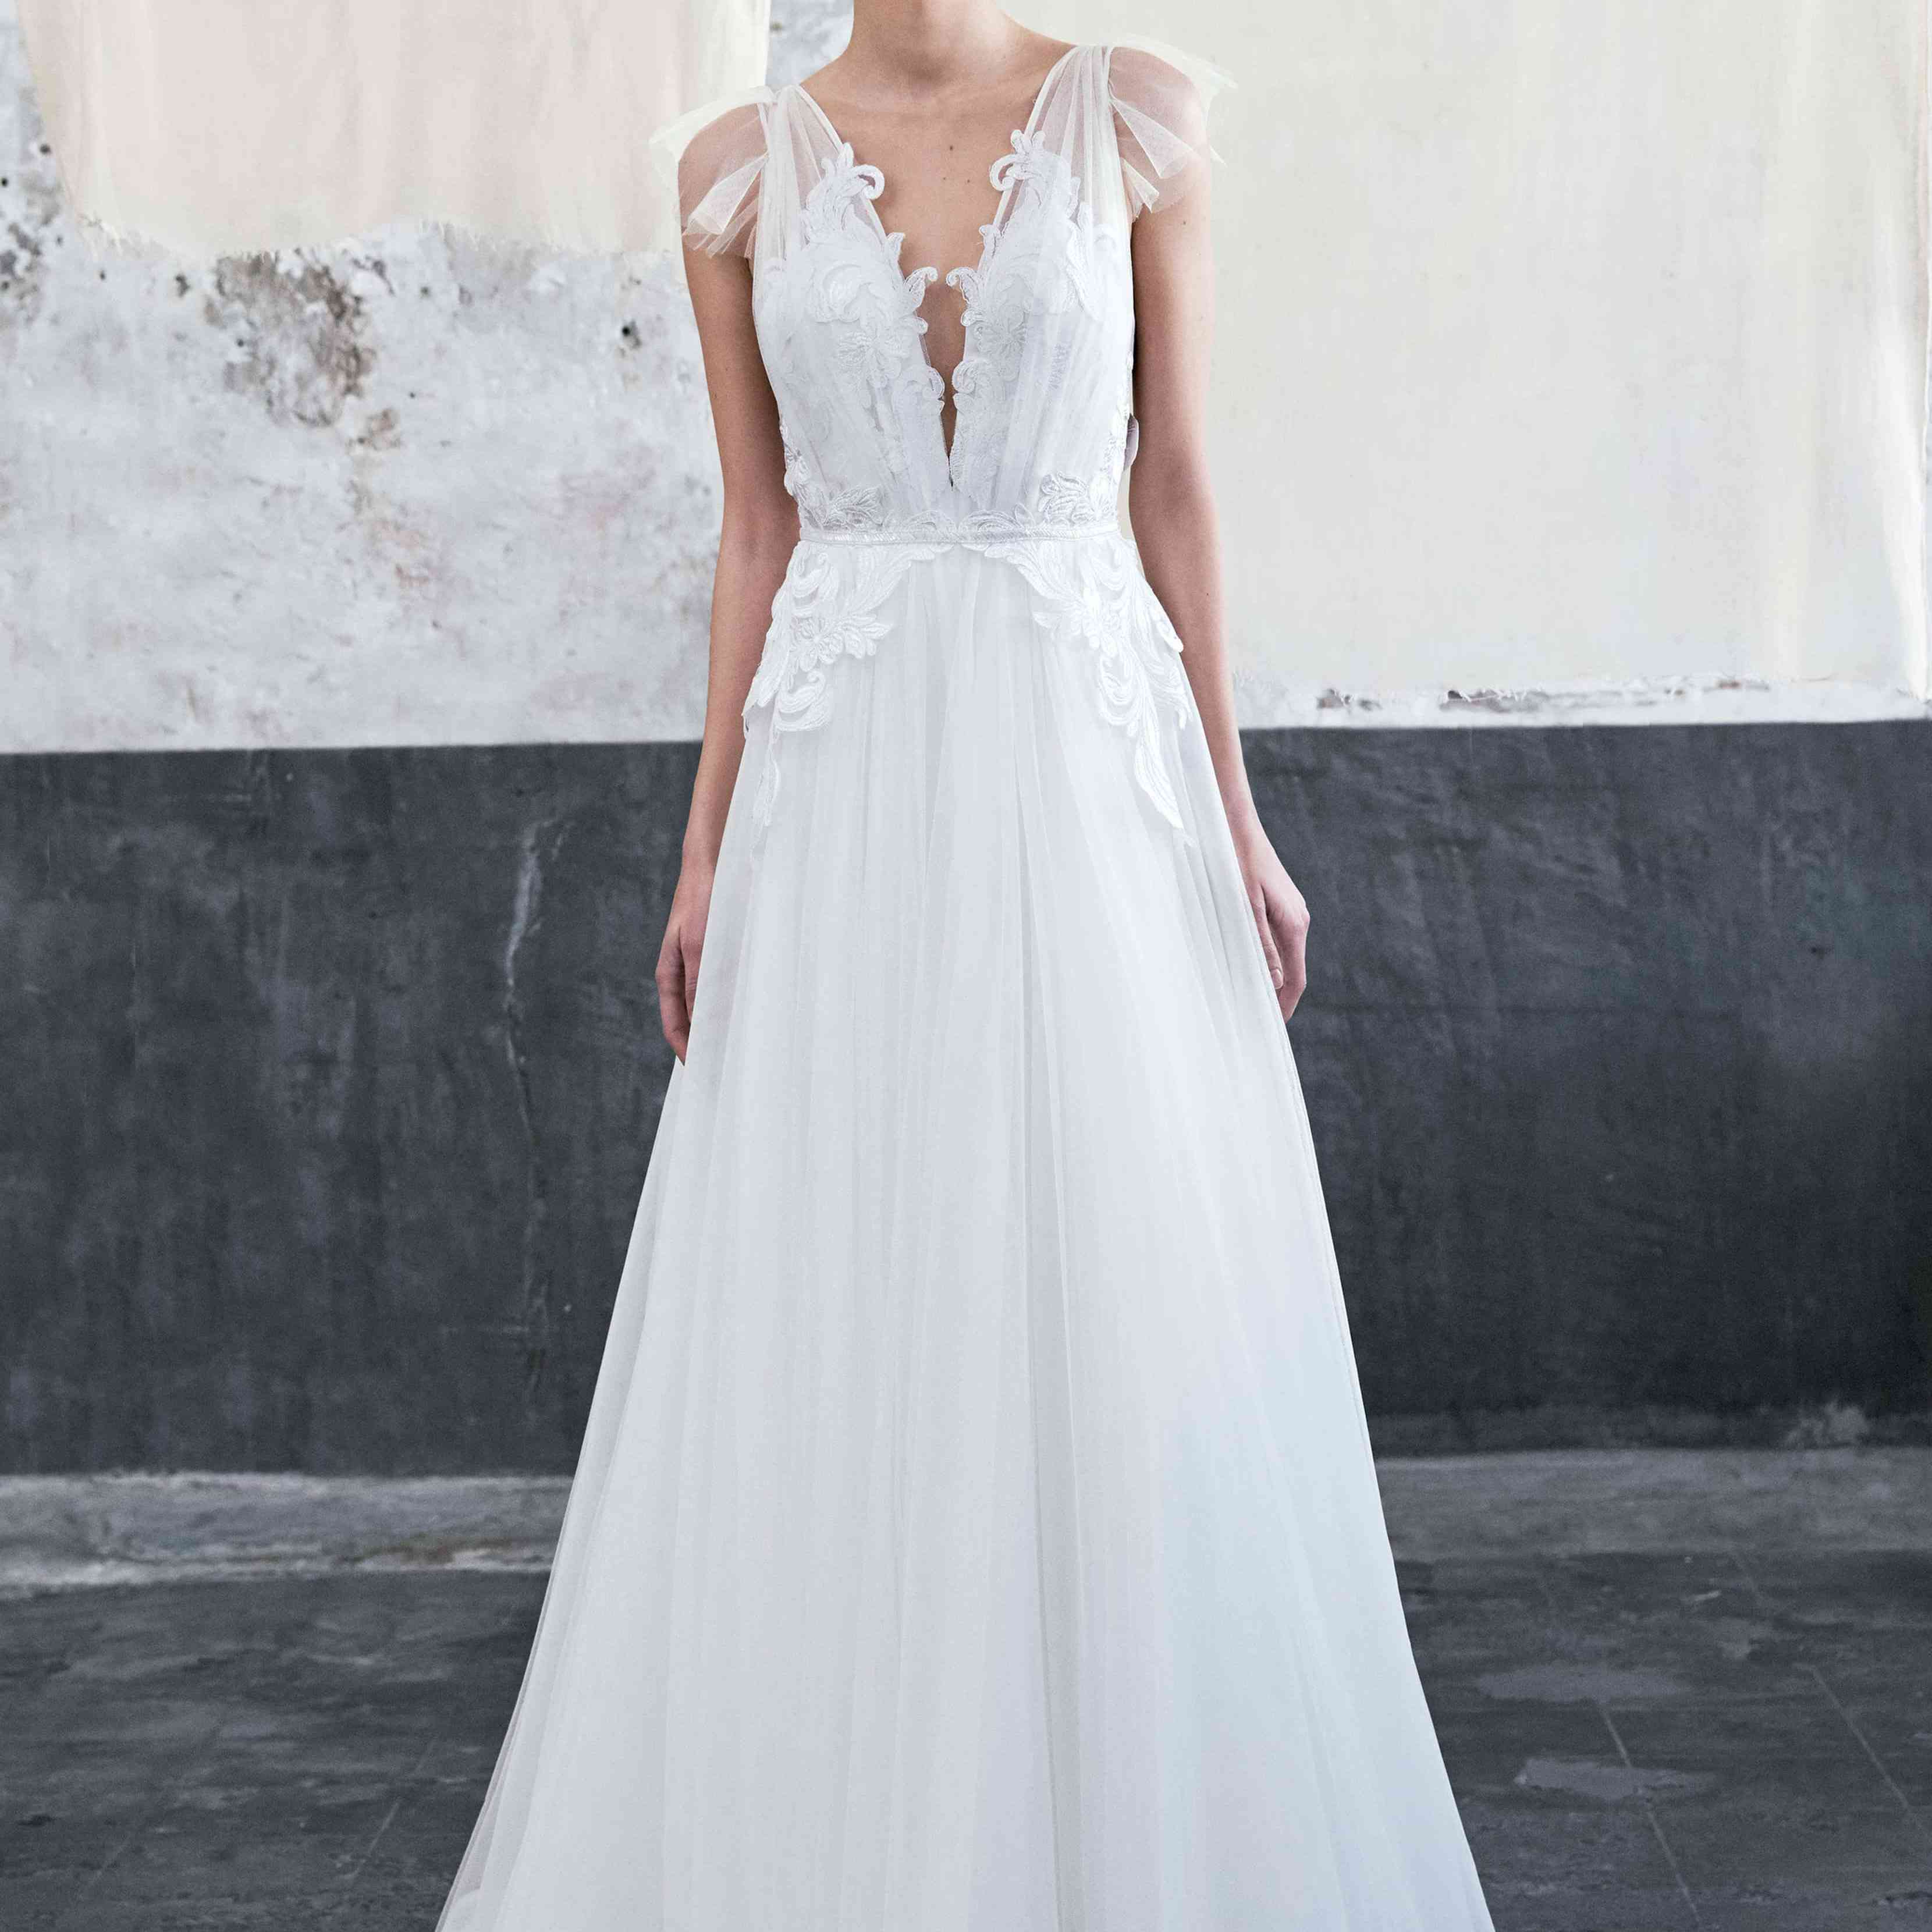 65 Plunging Neckline Wedding Dresses For The Daring Bride